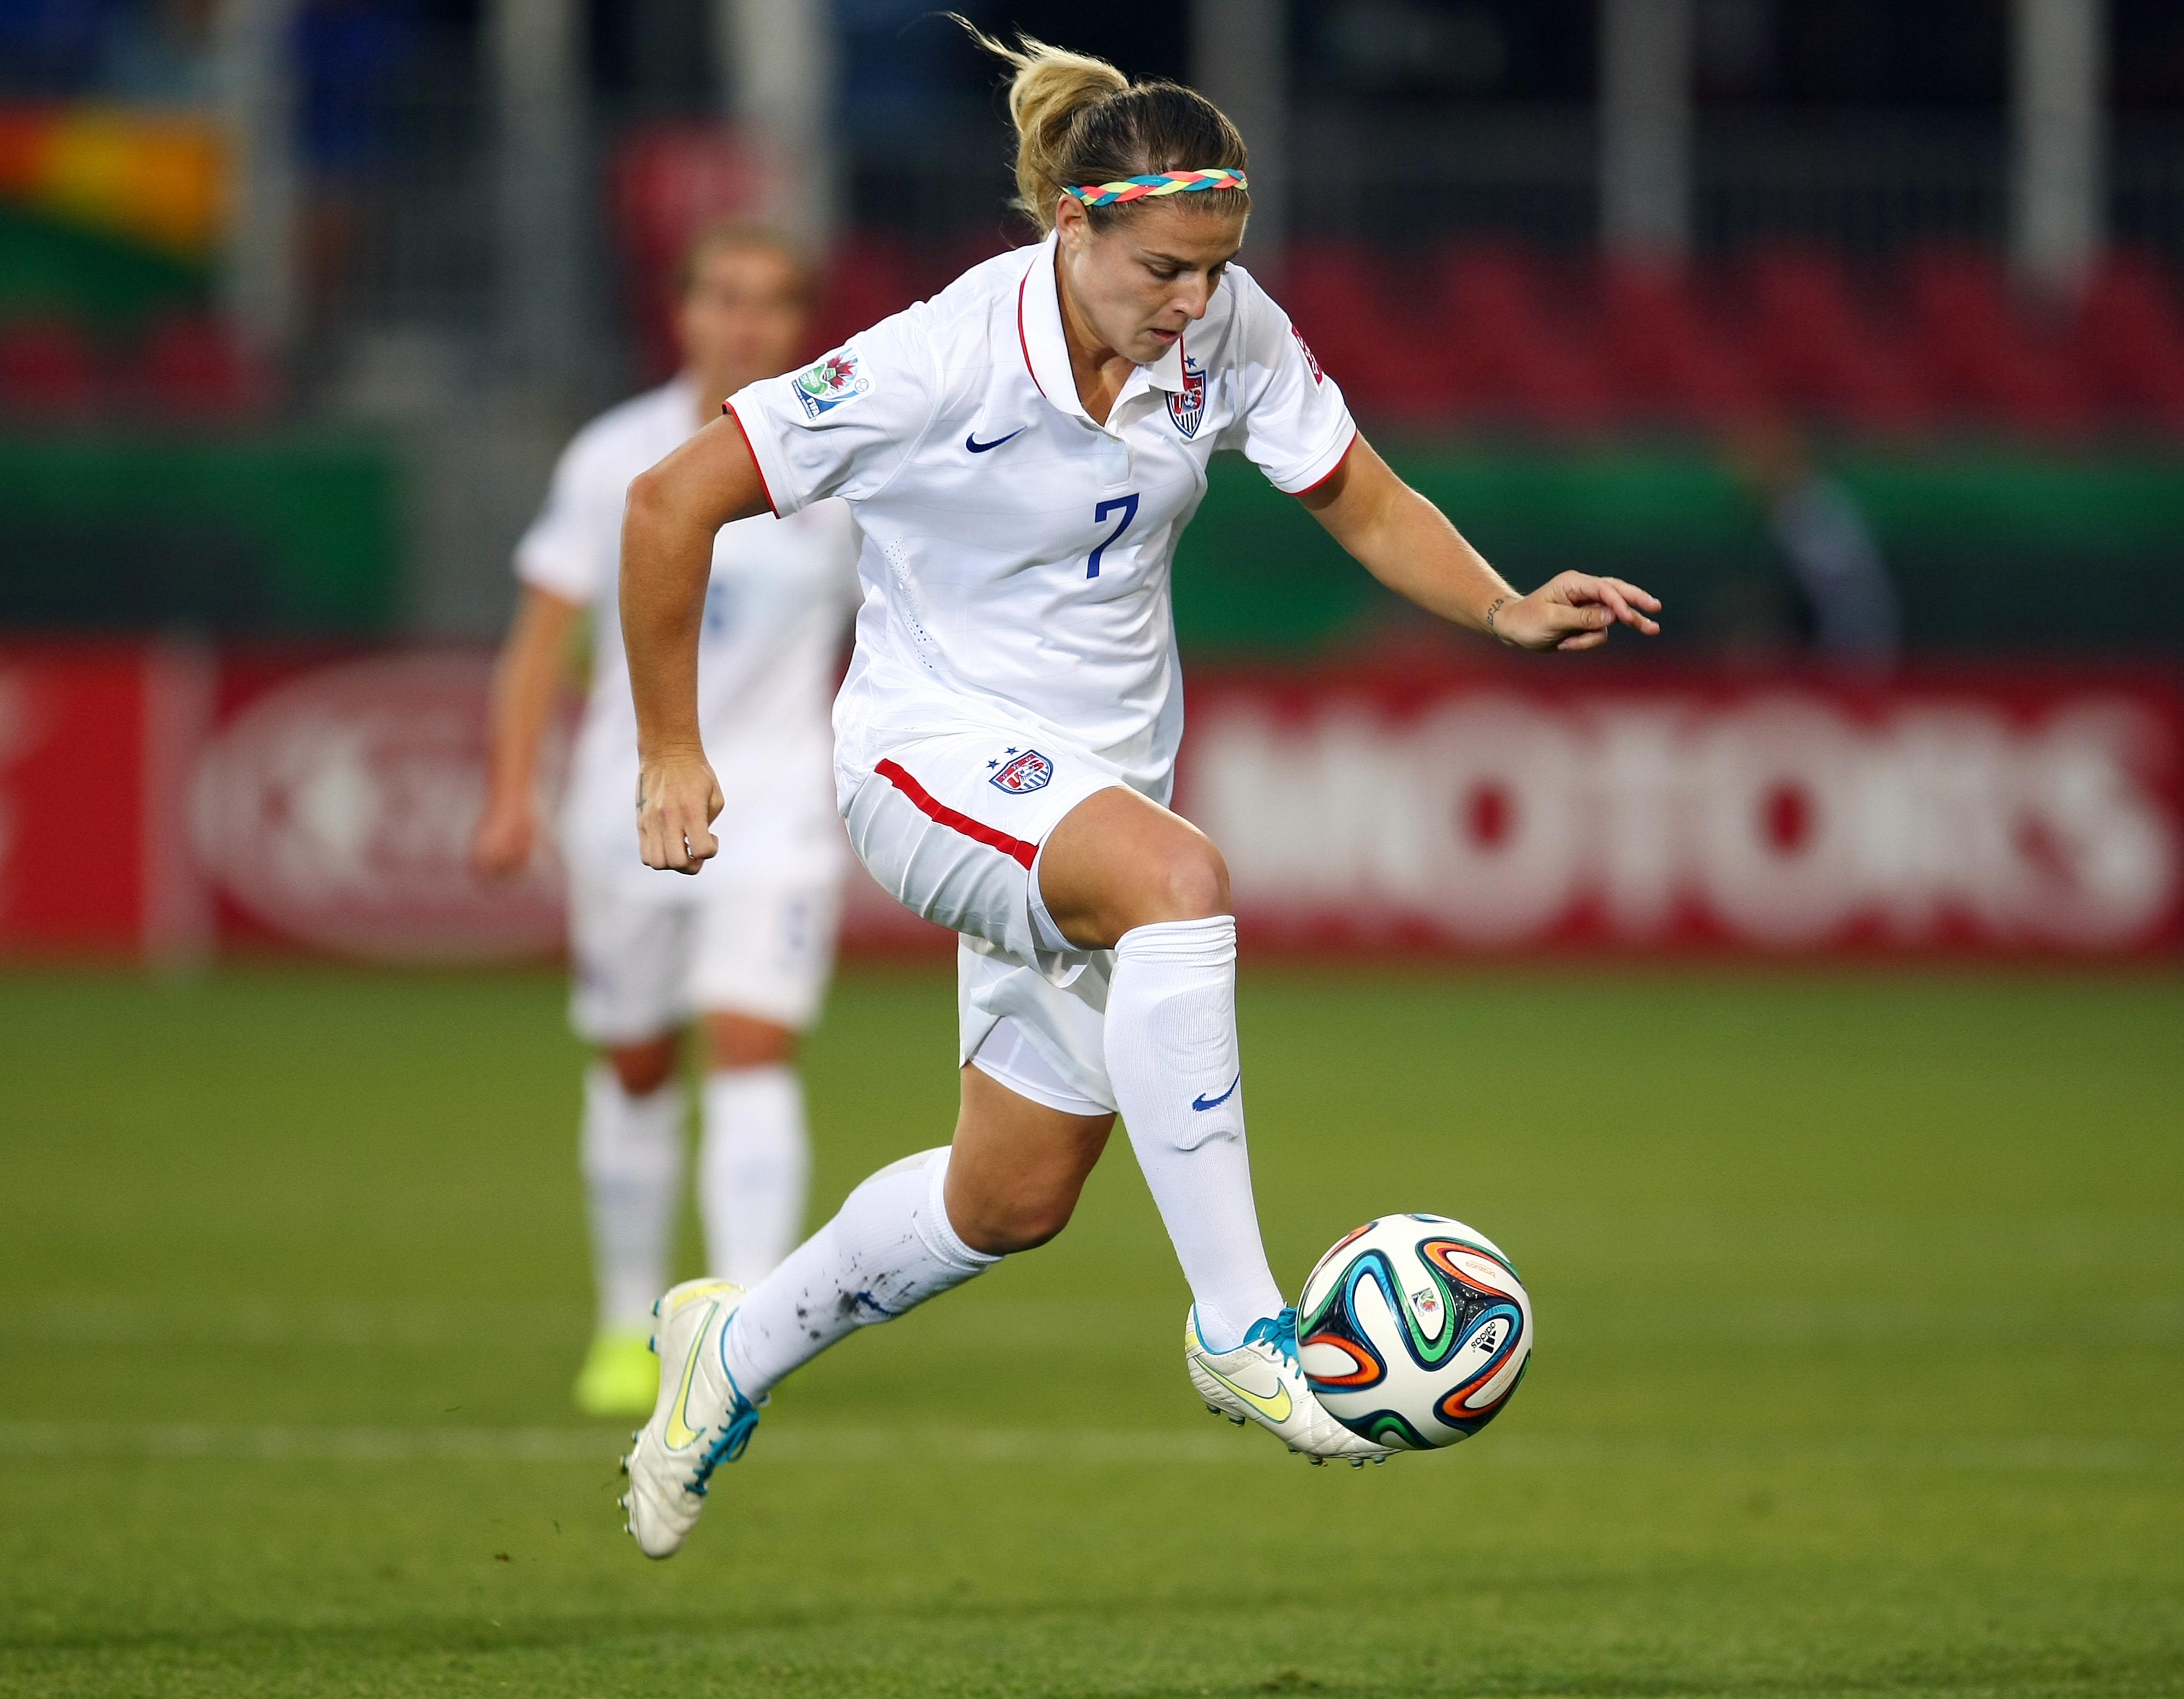 Florida's Savannah Jordan represented the United States at the FIFA U-20 Women's World Cup